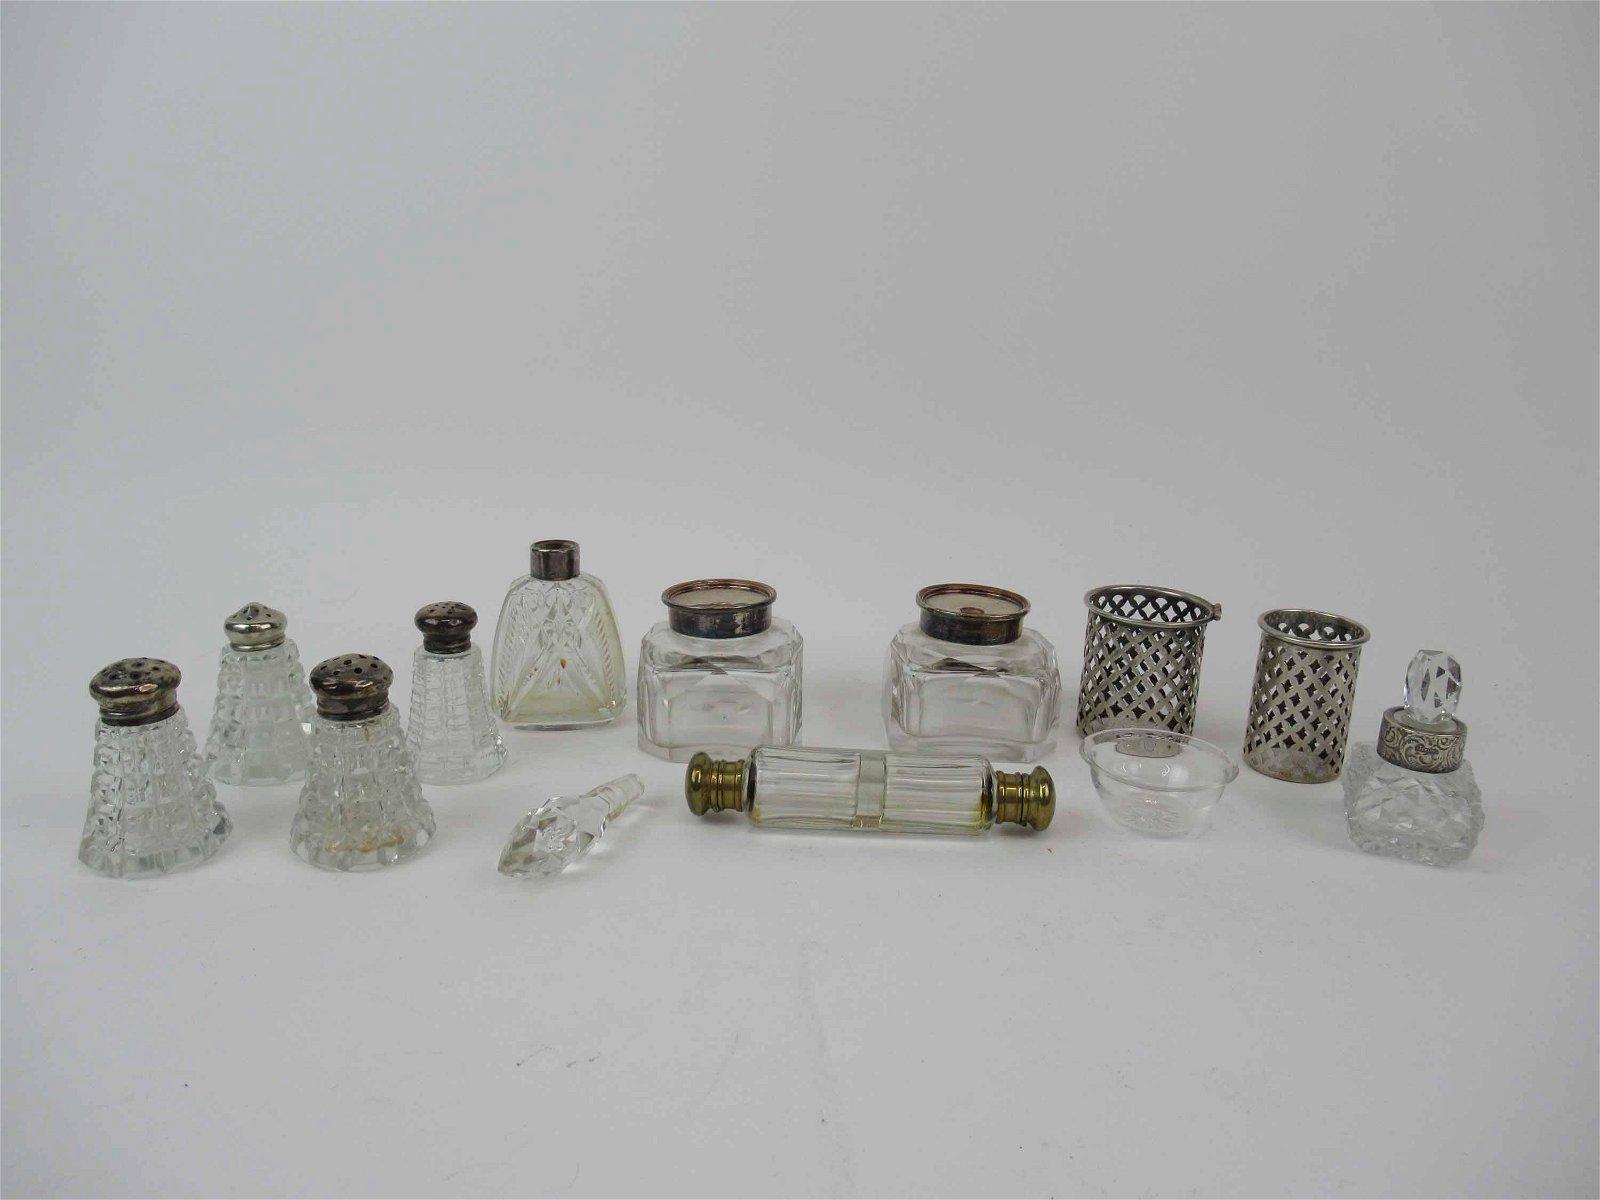 English Silver Mounted Perfume Bottle